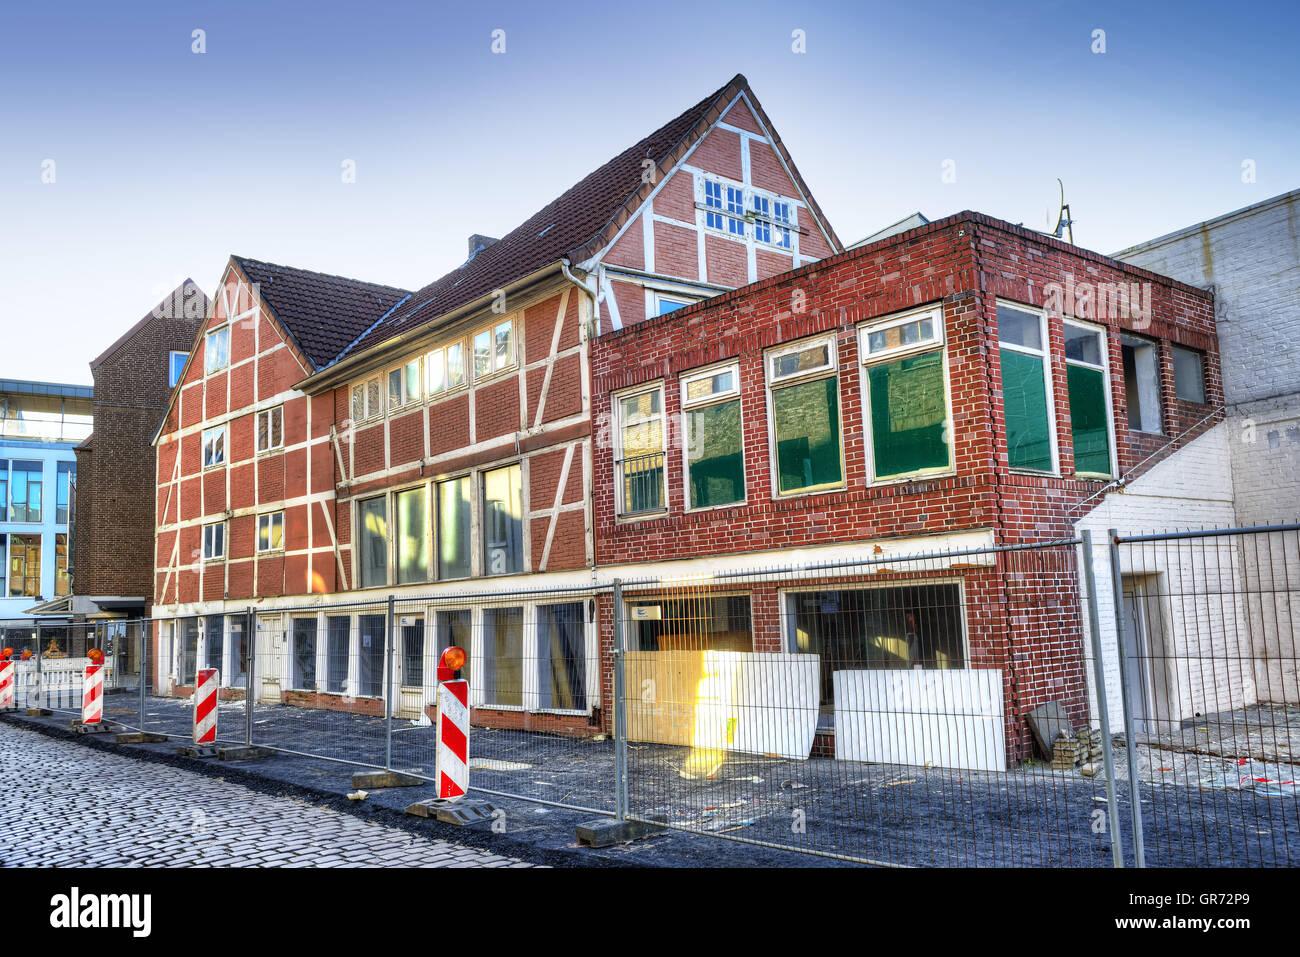 Schuettfort Storehouse In Hamburg, Germany - Stock Image